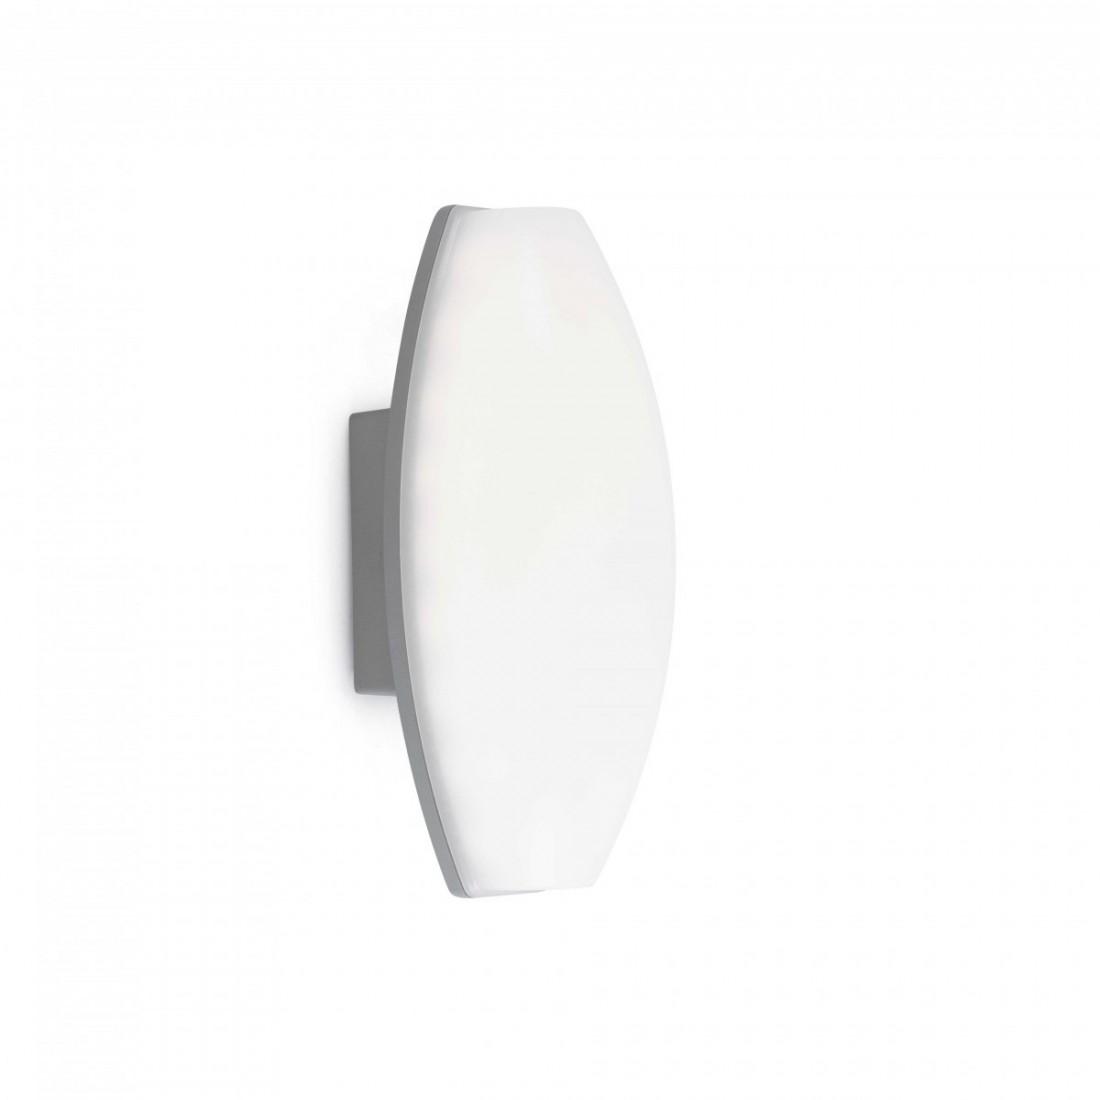 Apliques espejo apliques para espejo ba o apliques facil instalacion - Aplique espejo bano ...